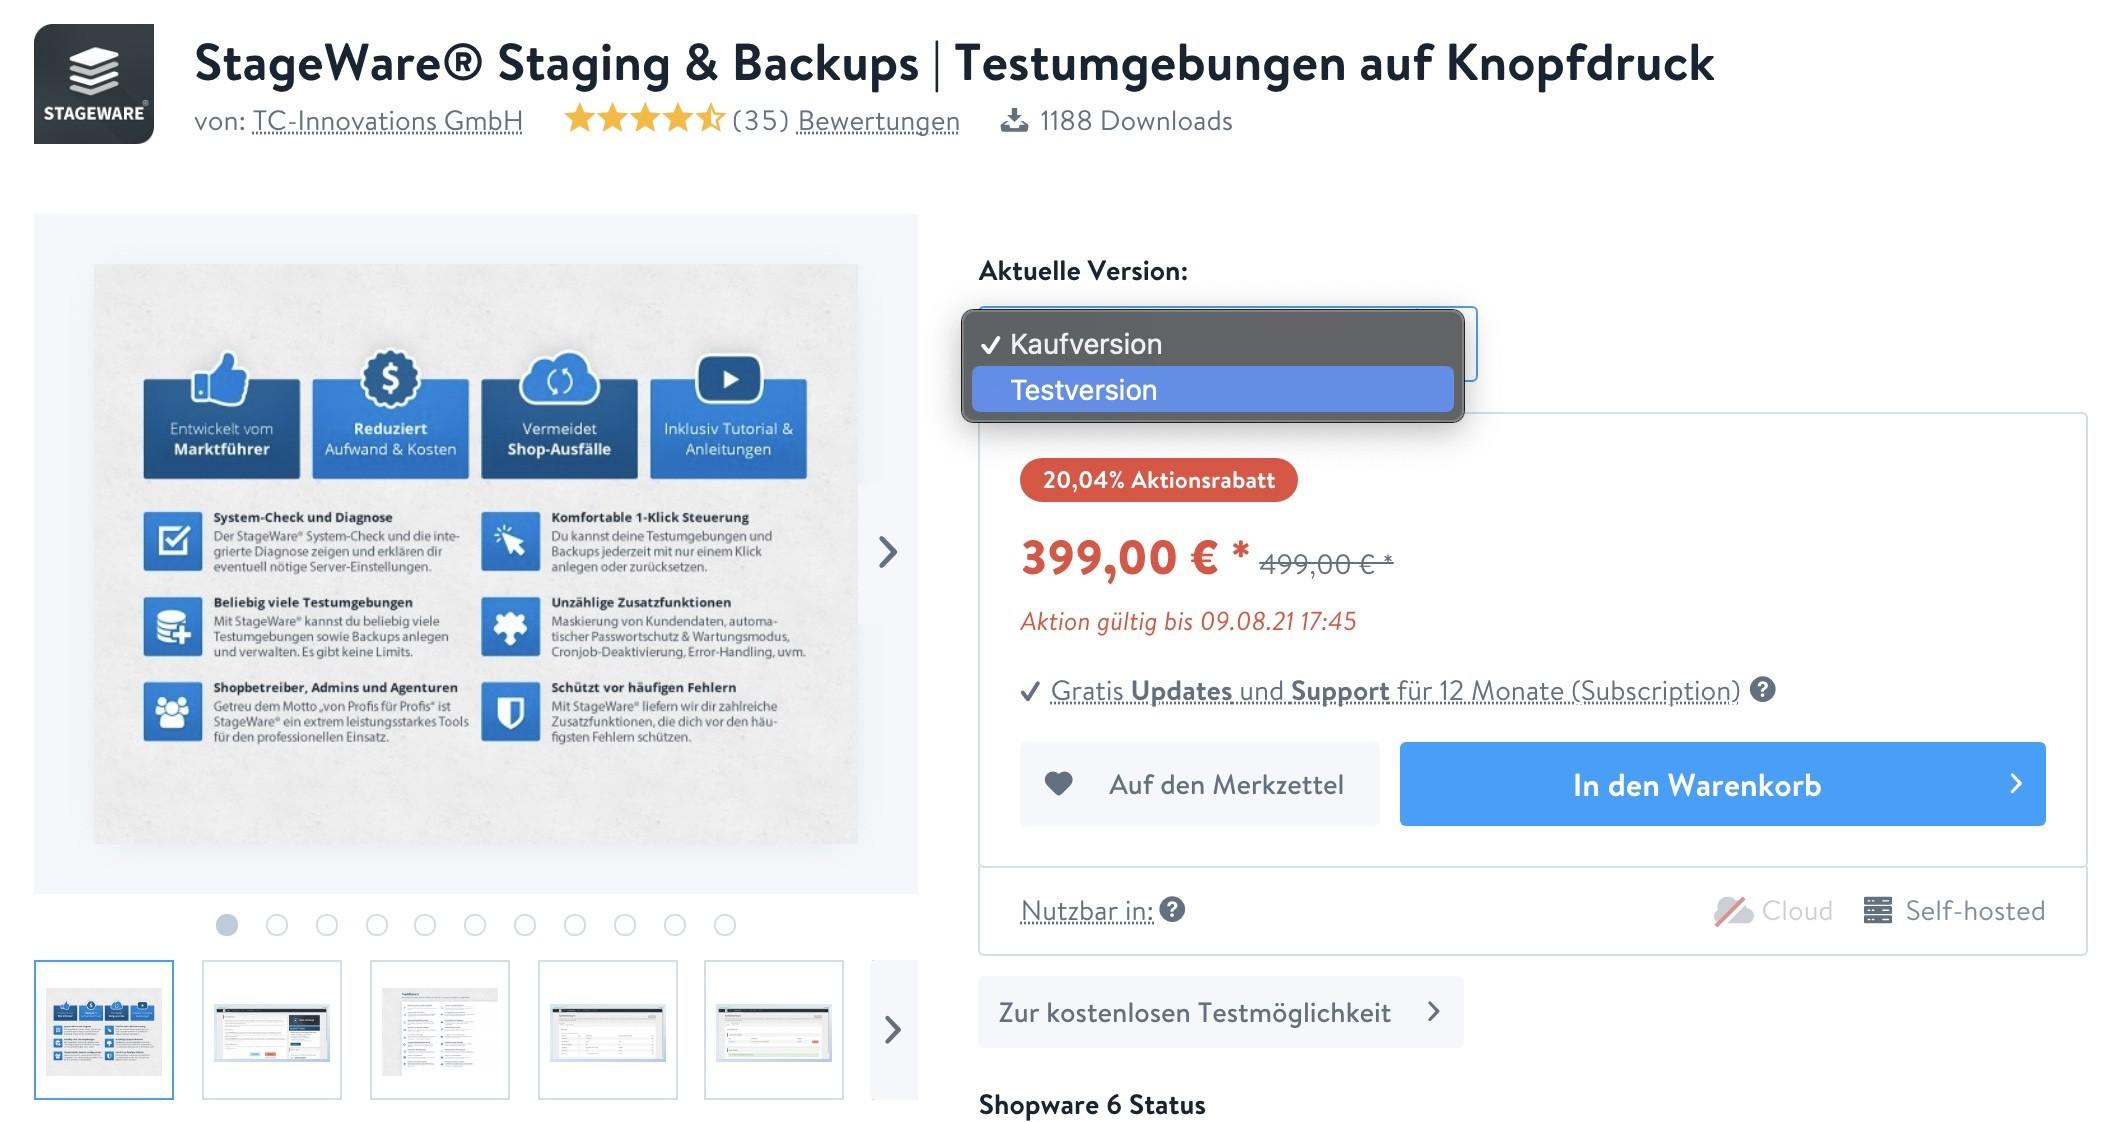 Shopware Staging - StageWare 1 - Testversion